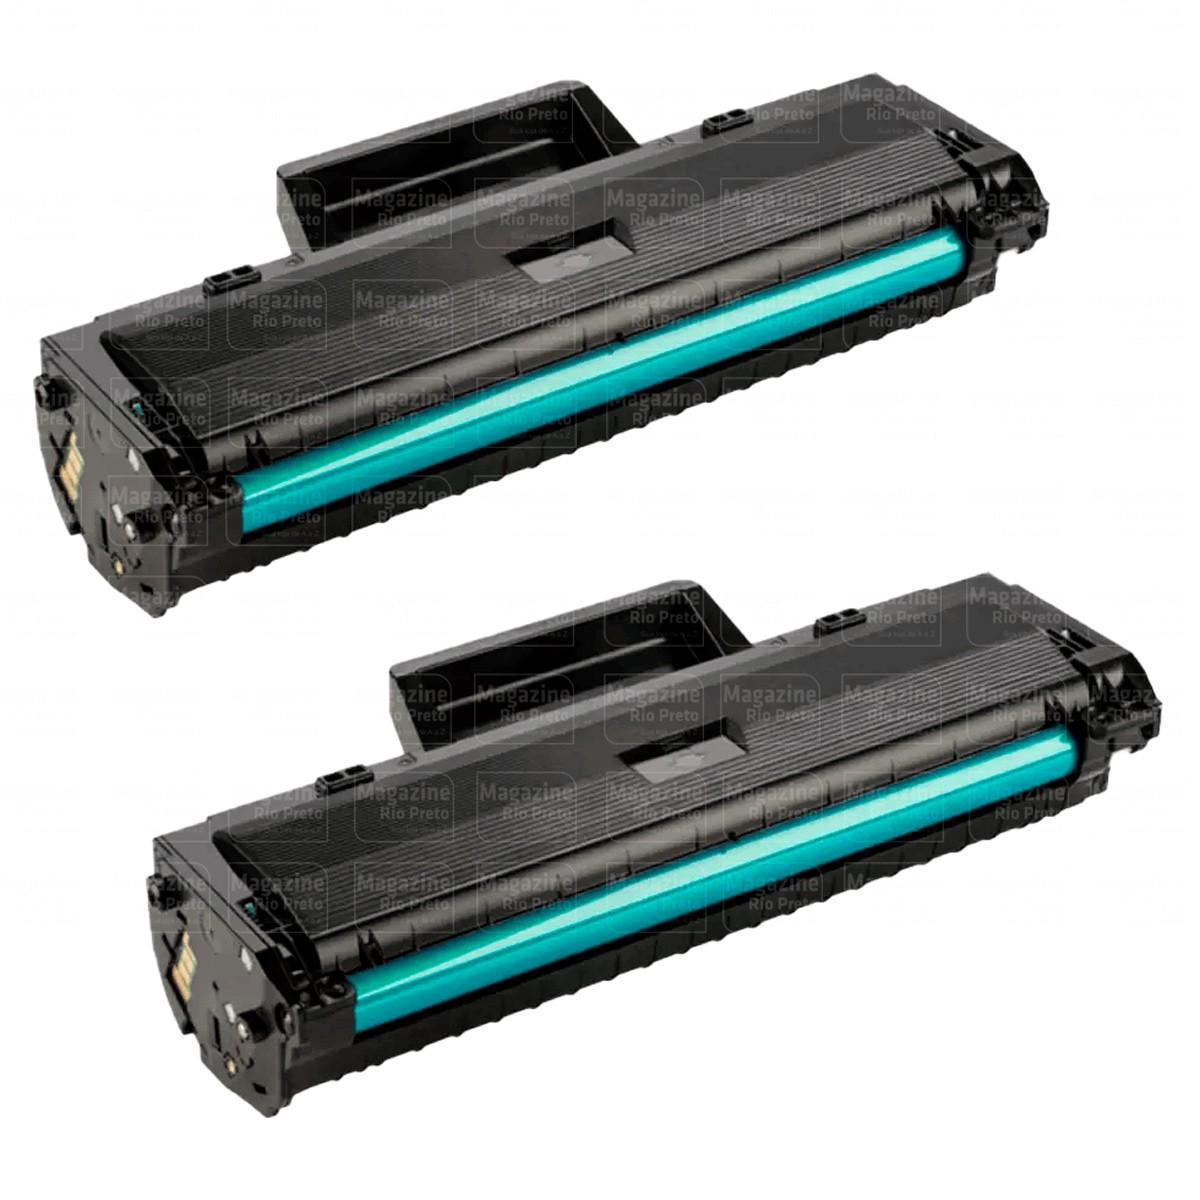 Kit 2 Toner Compatível W1105 105A | M107A M107W M135A M135W Sem Chip